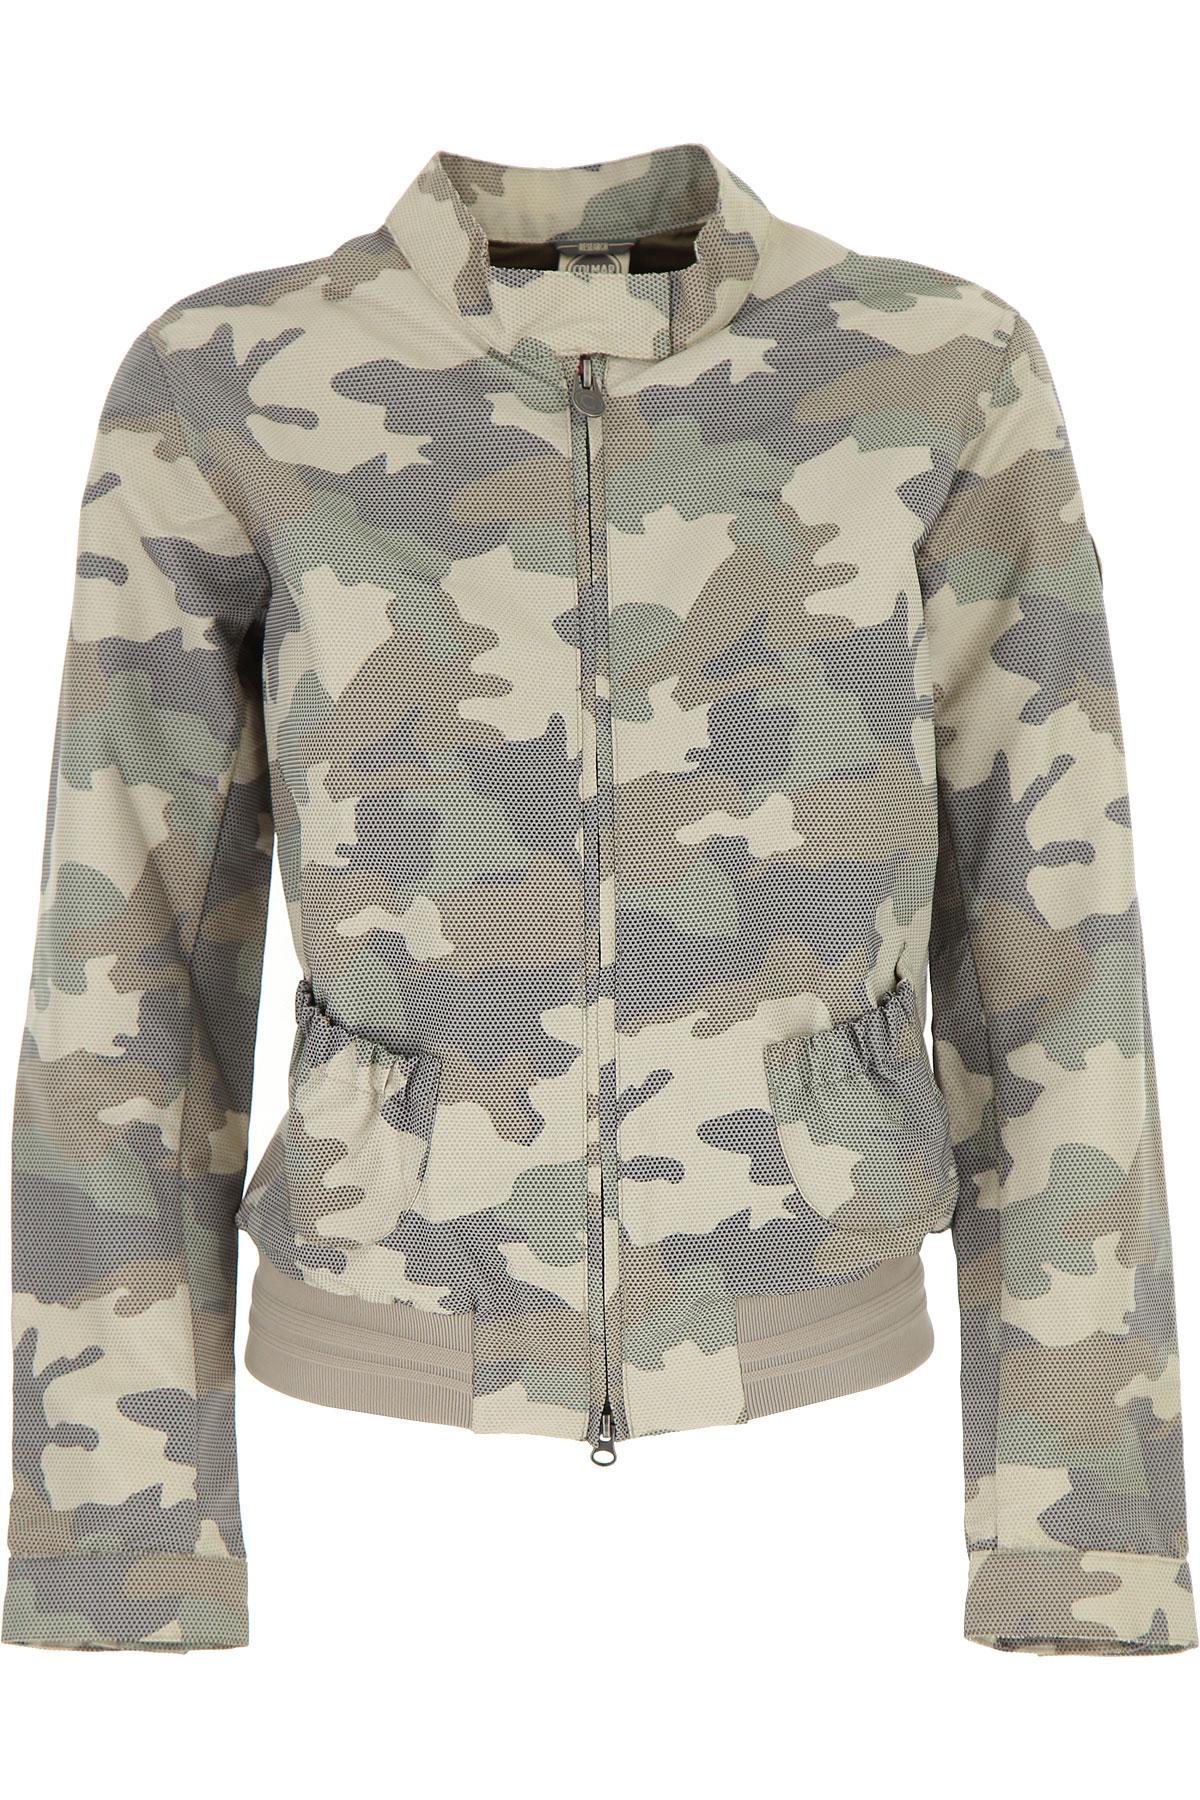 Colmar Jacket for Women On Sale in Outlet, Beige, polyester, 2019, 2 4